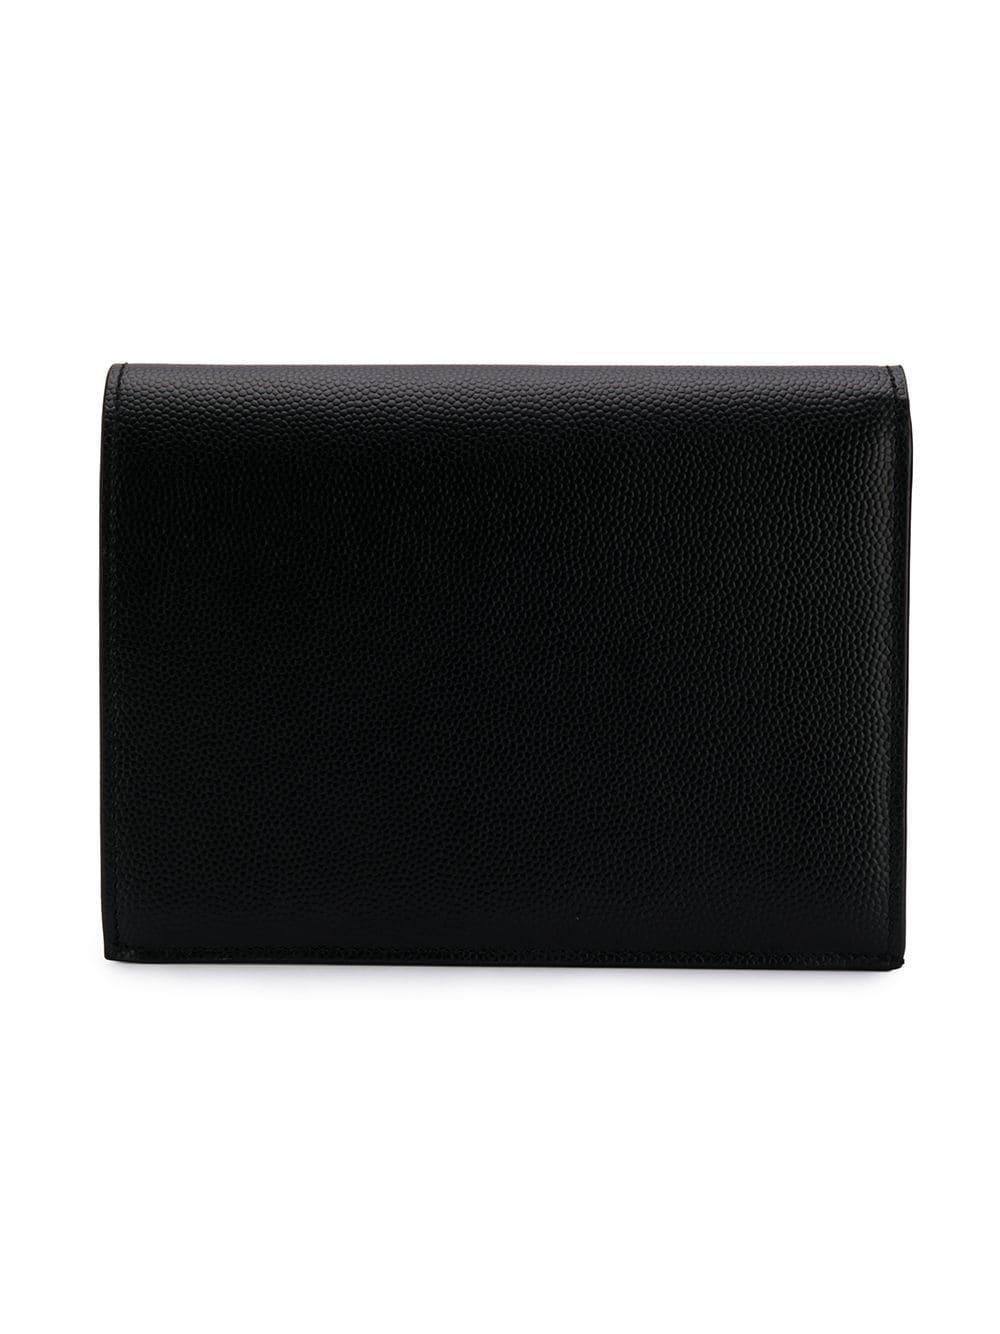 df3ed11b9c6 Lyst - Saint Laurent Billfold Logo Wallet in Black for Men